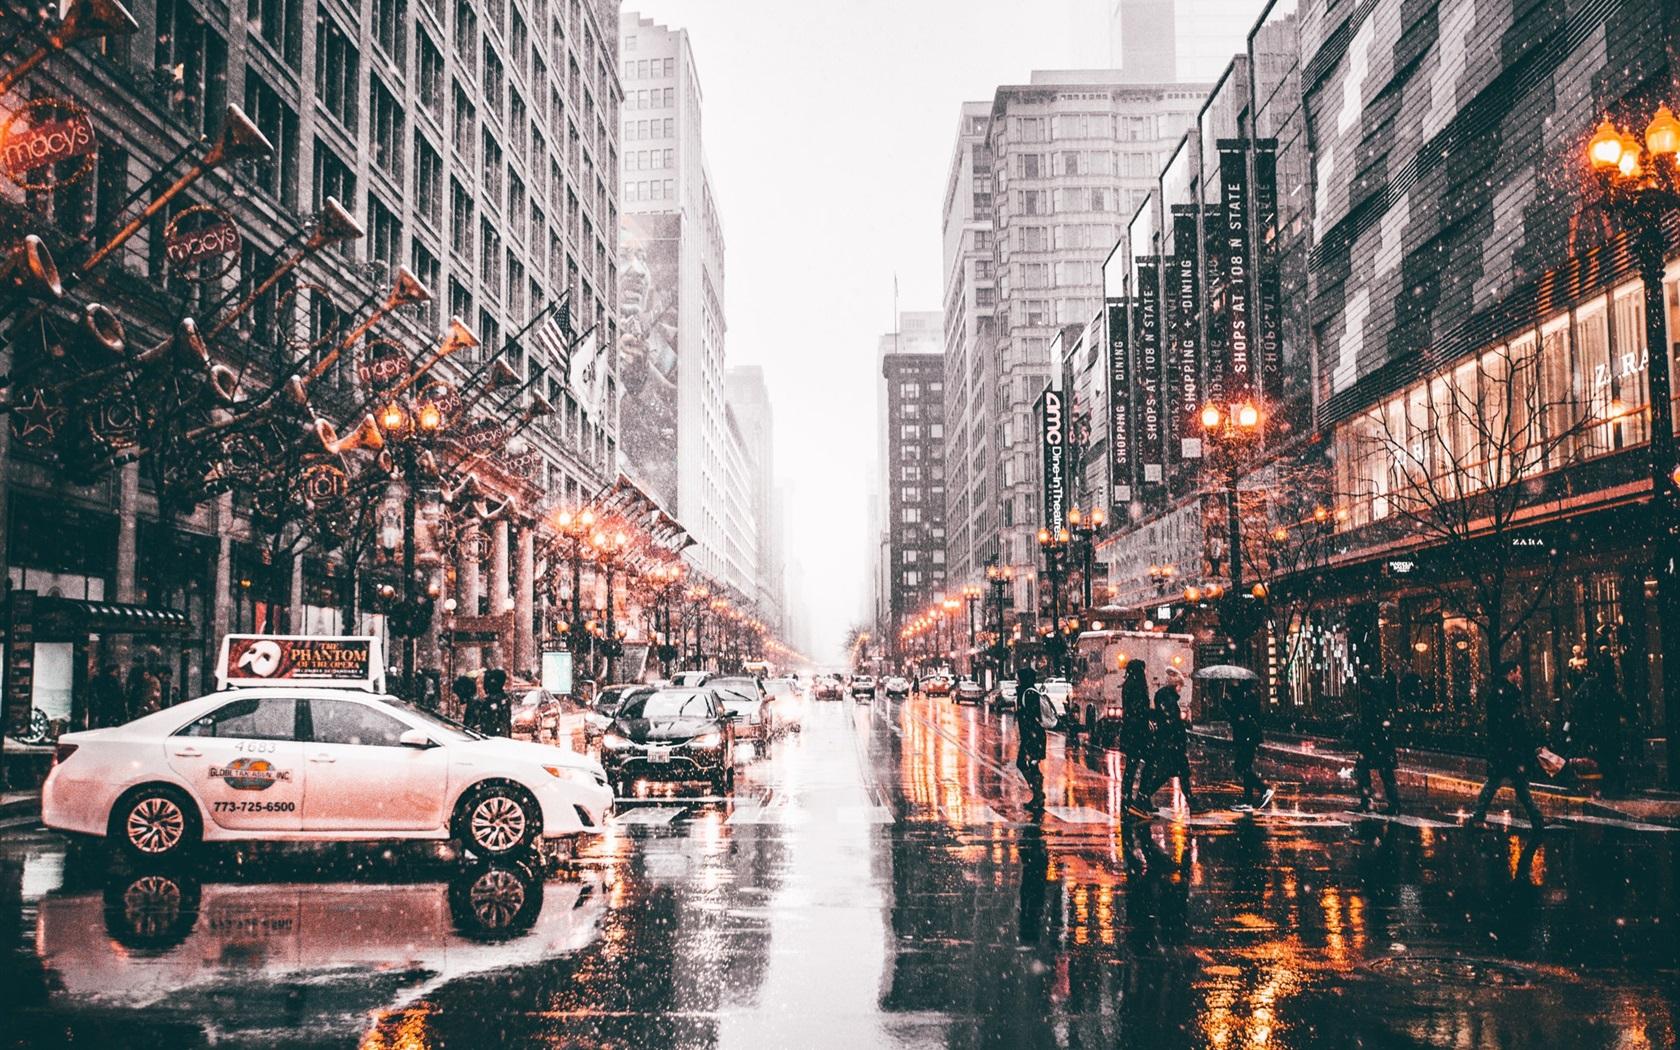 Wallpaper Chicago Usa City Street Snowy Wet Road